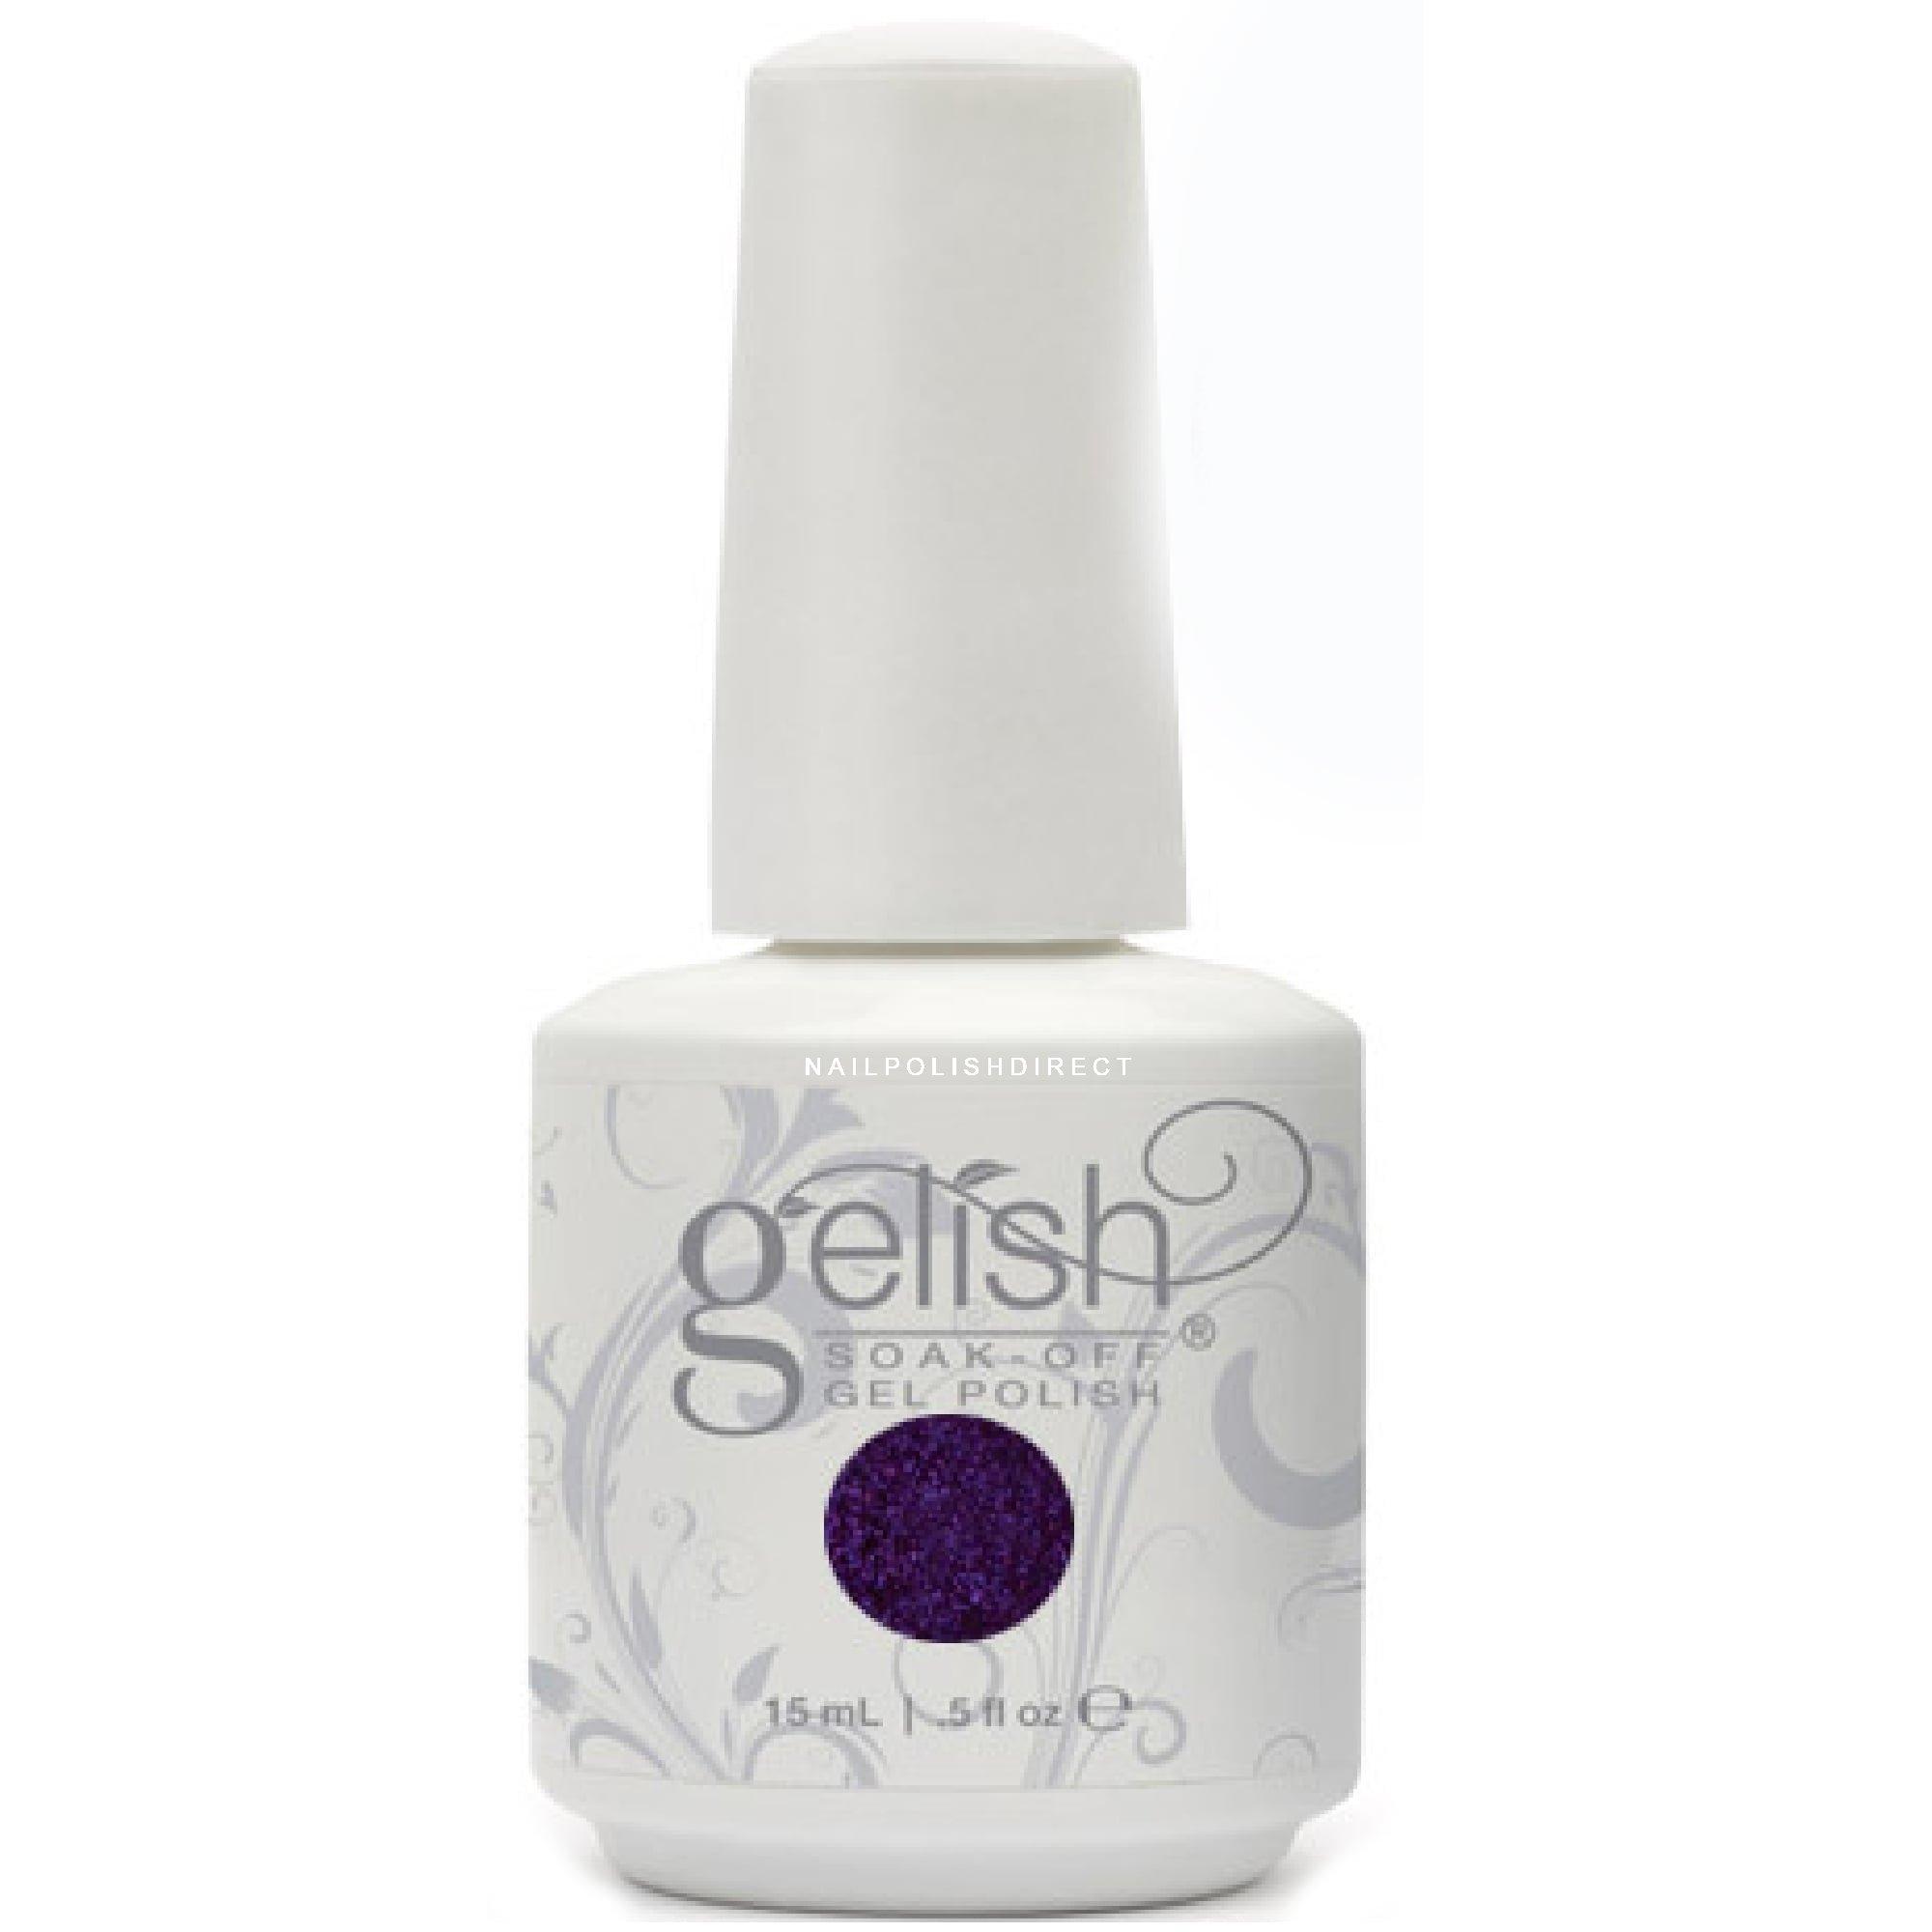 Gelish Soak-Off Gel Nail Polish - Call Me Jill Frost 15ml